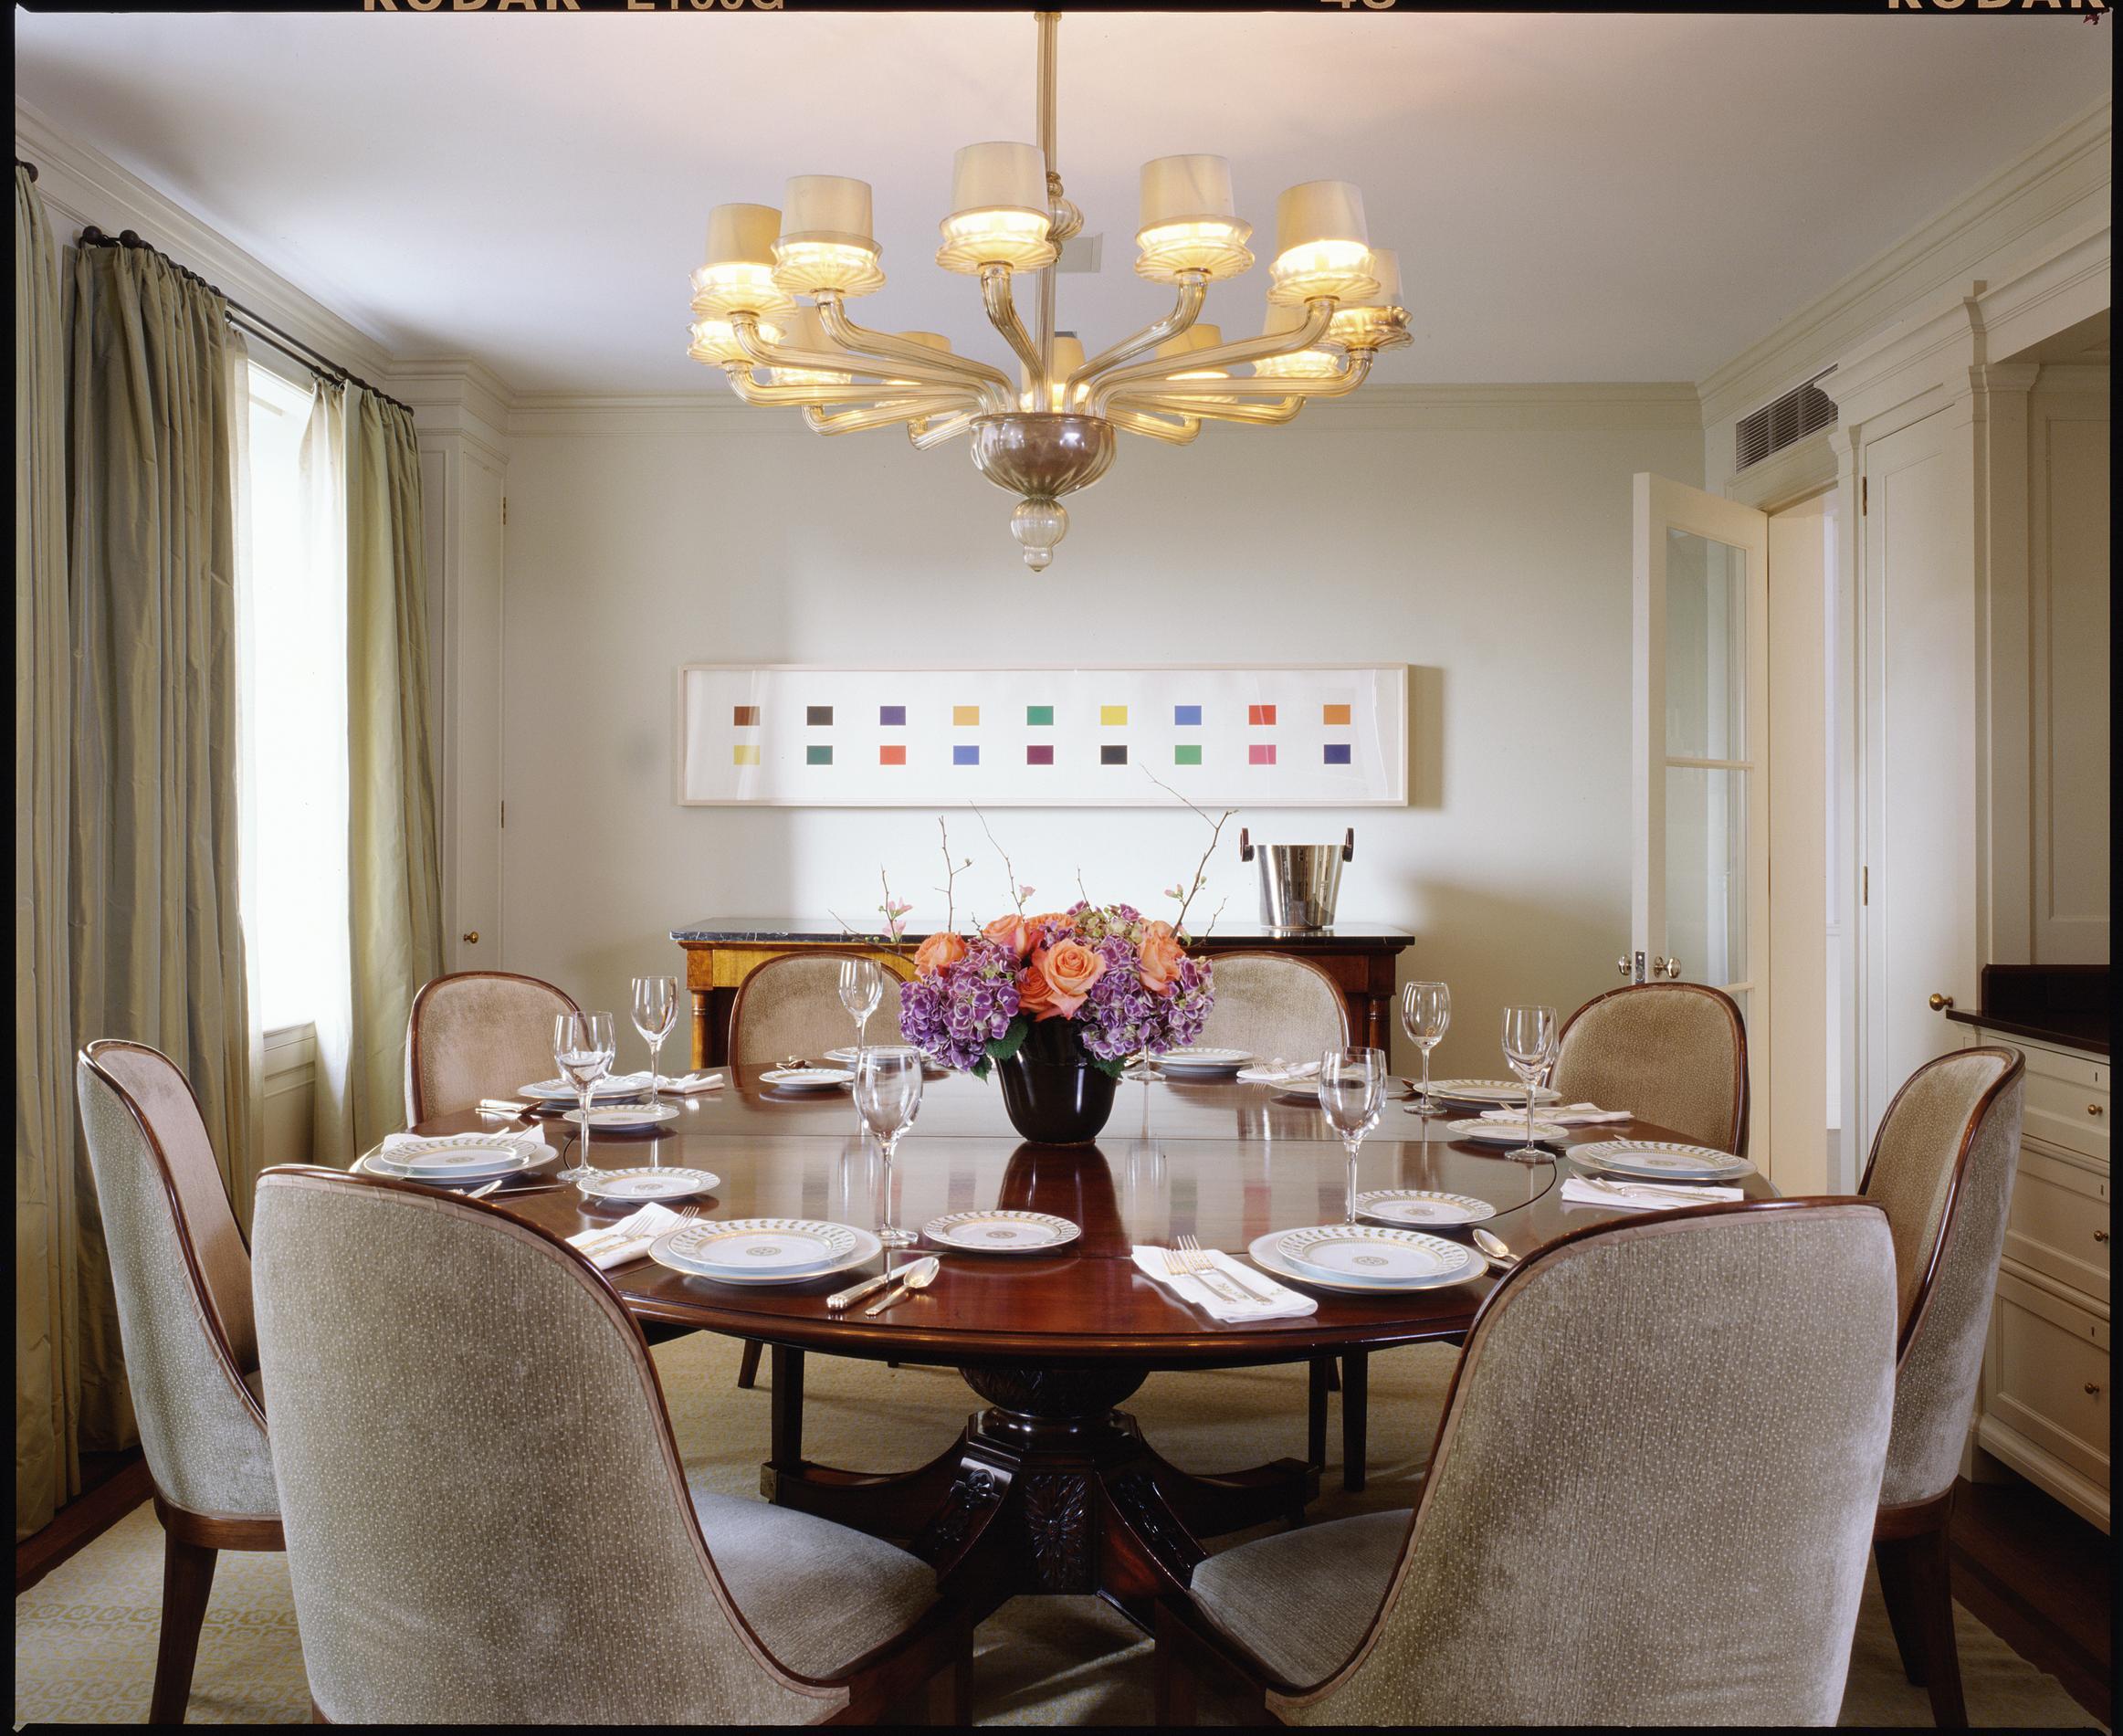 mariette-himes-gomez-park-avenue-apartment_25037345971_o.jpg